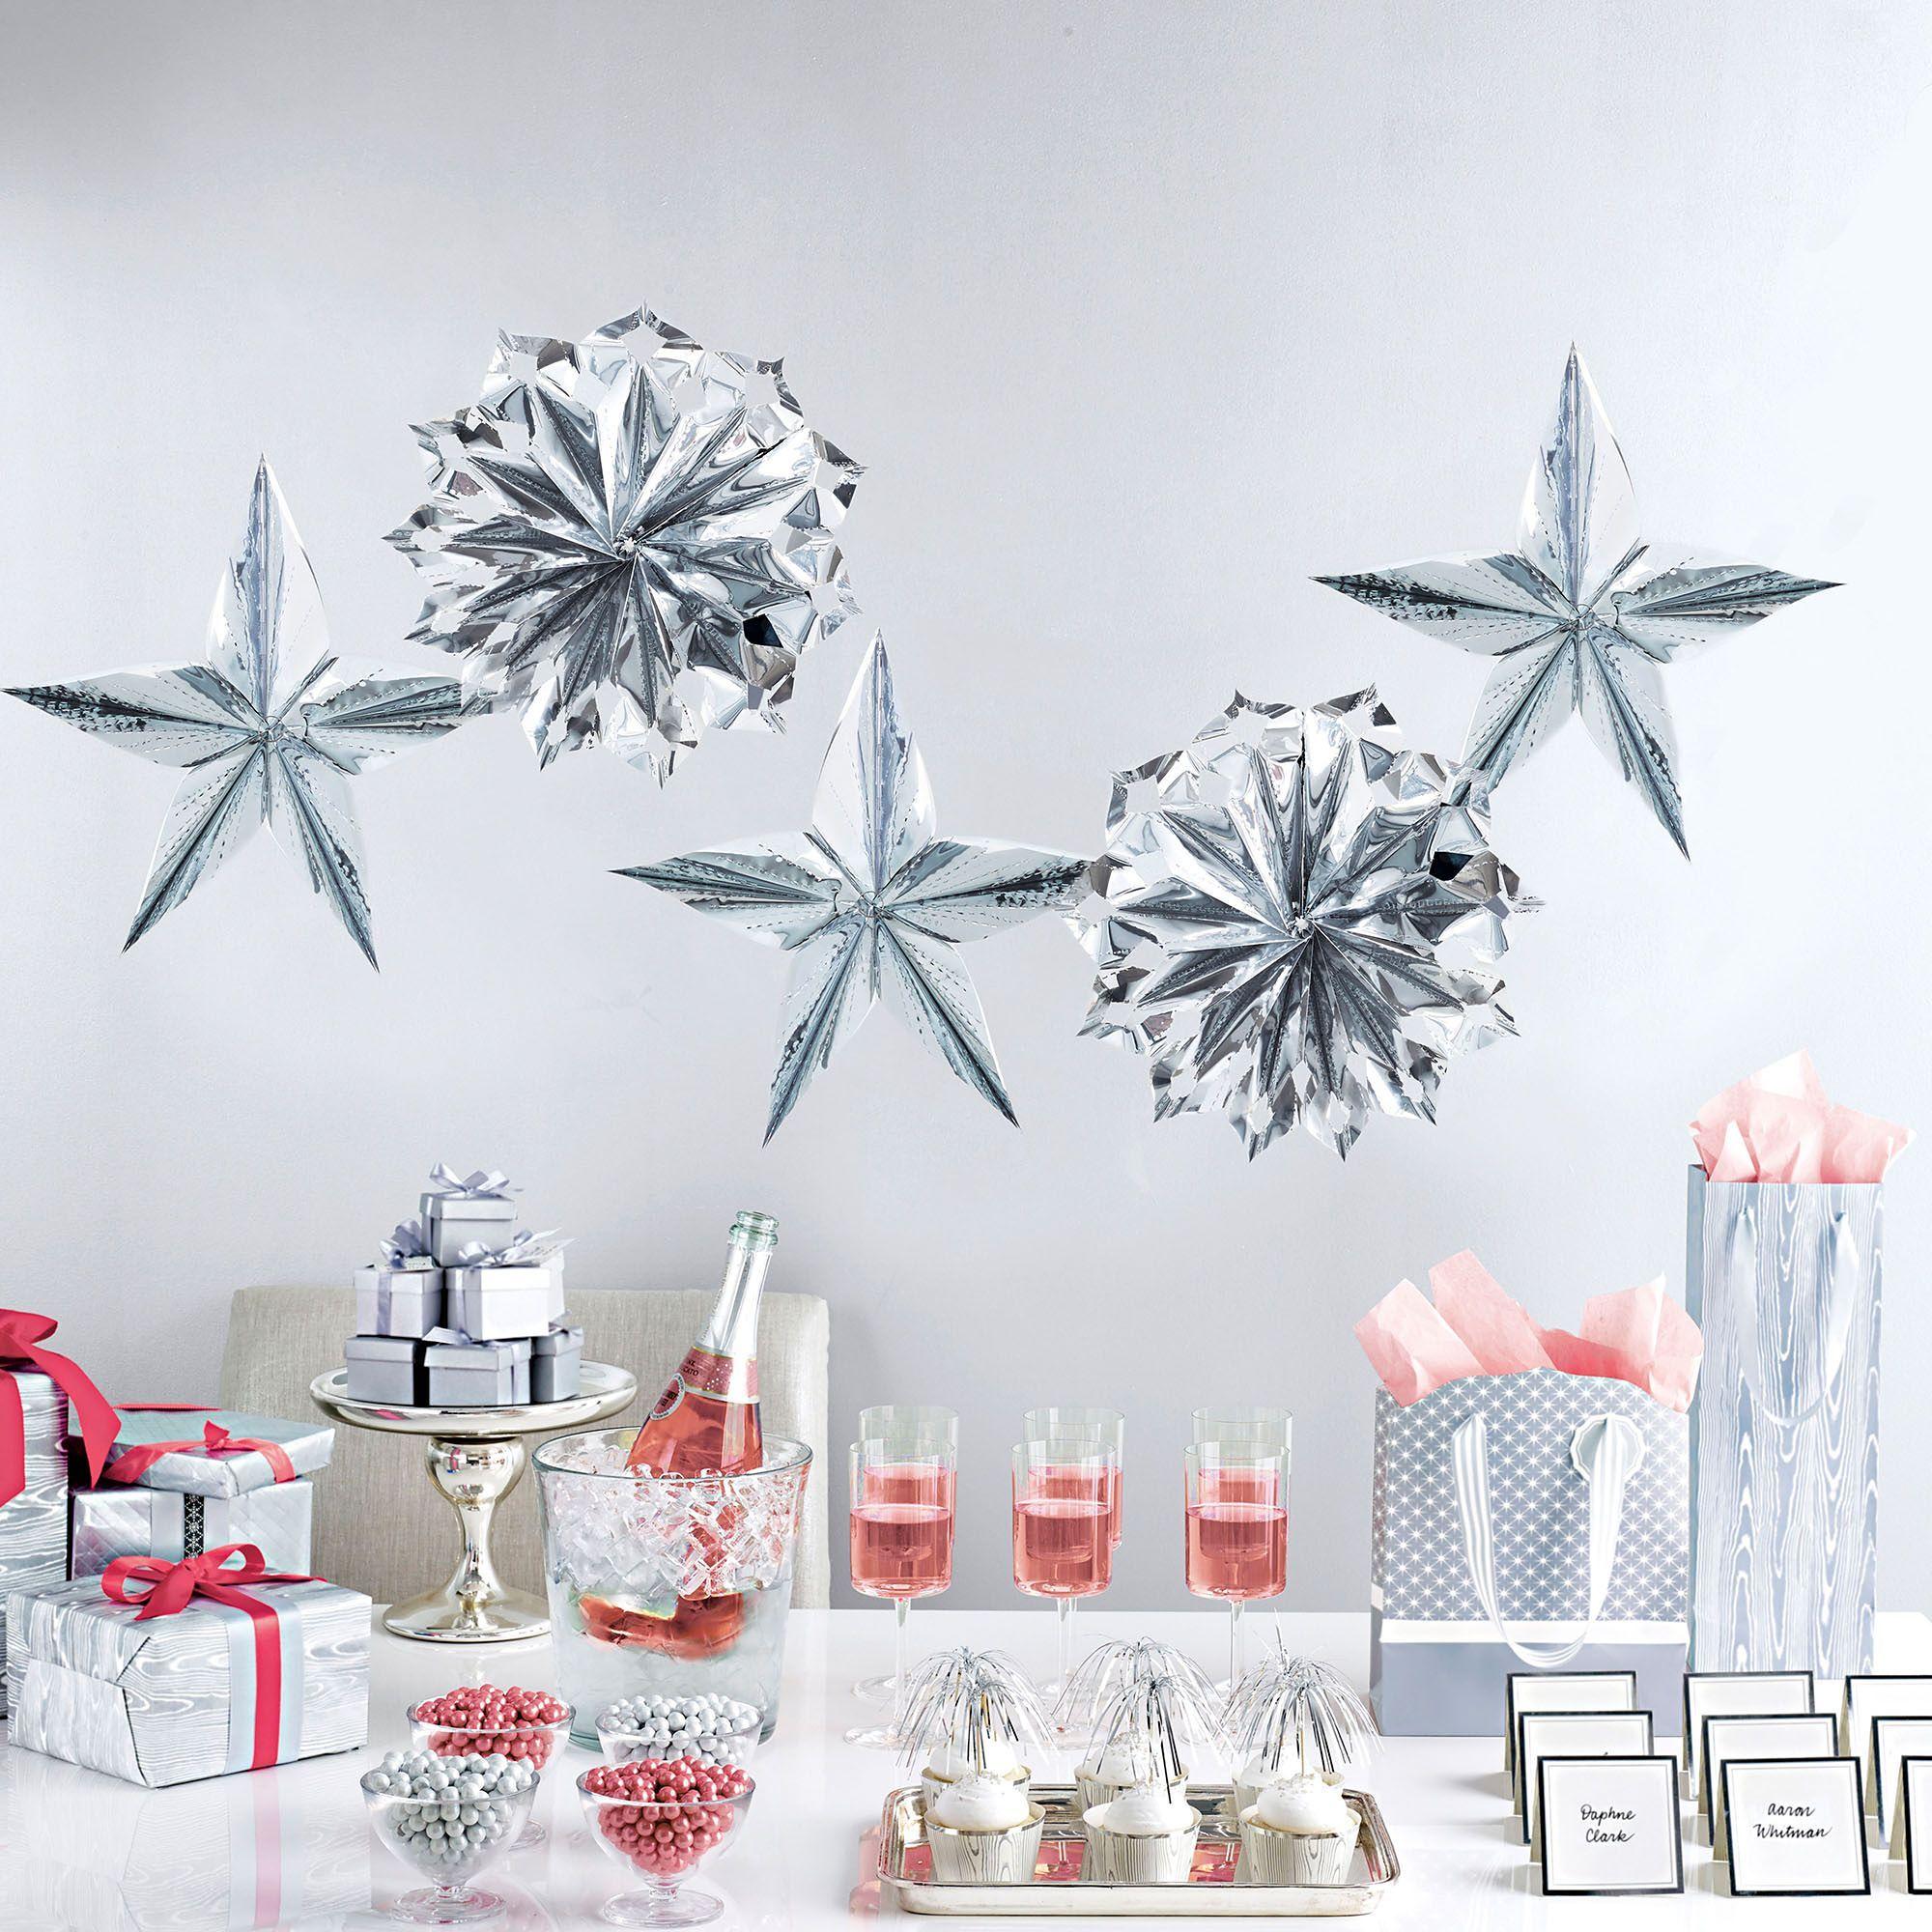 martha stewart for jcp foil decorations | craft supplies | Pinterest ...